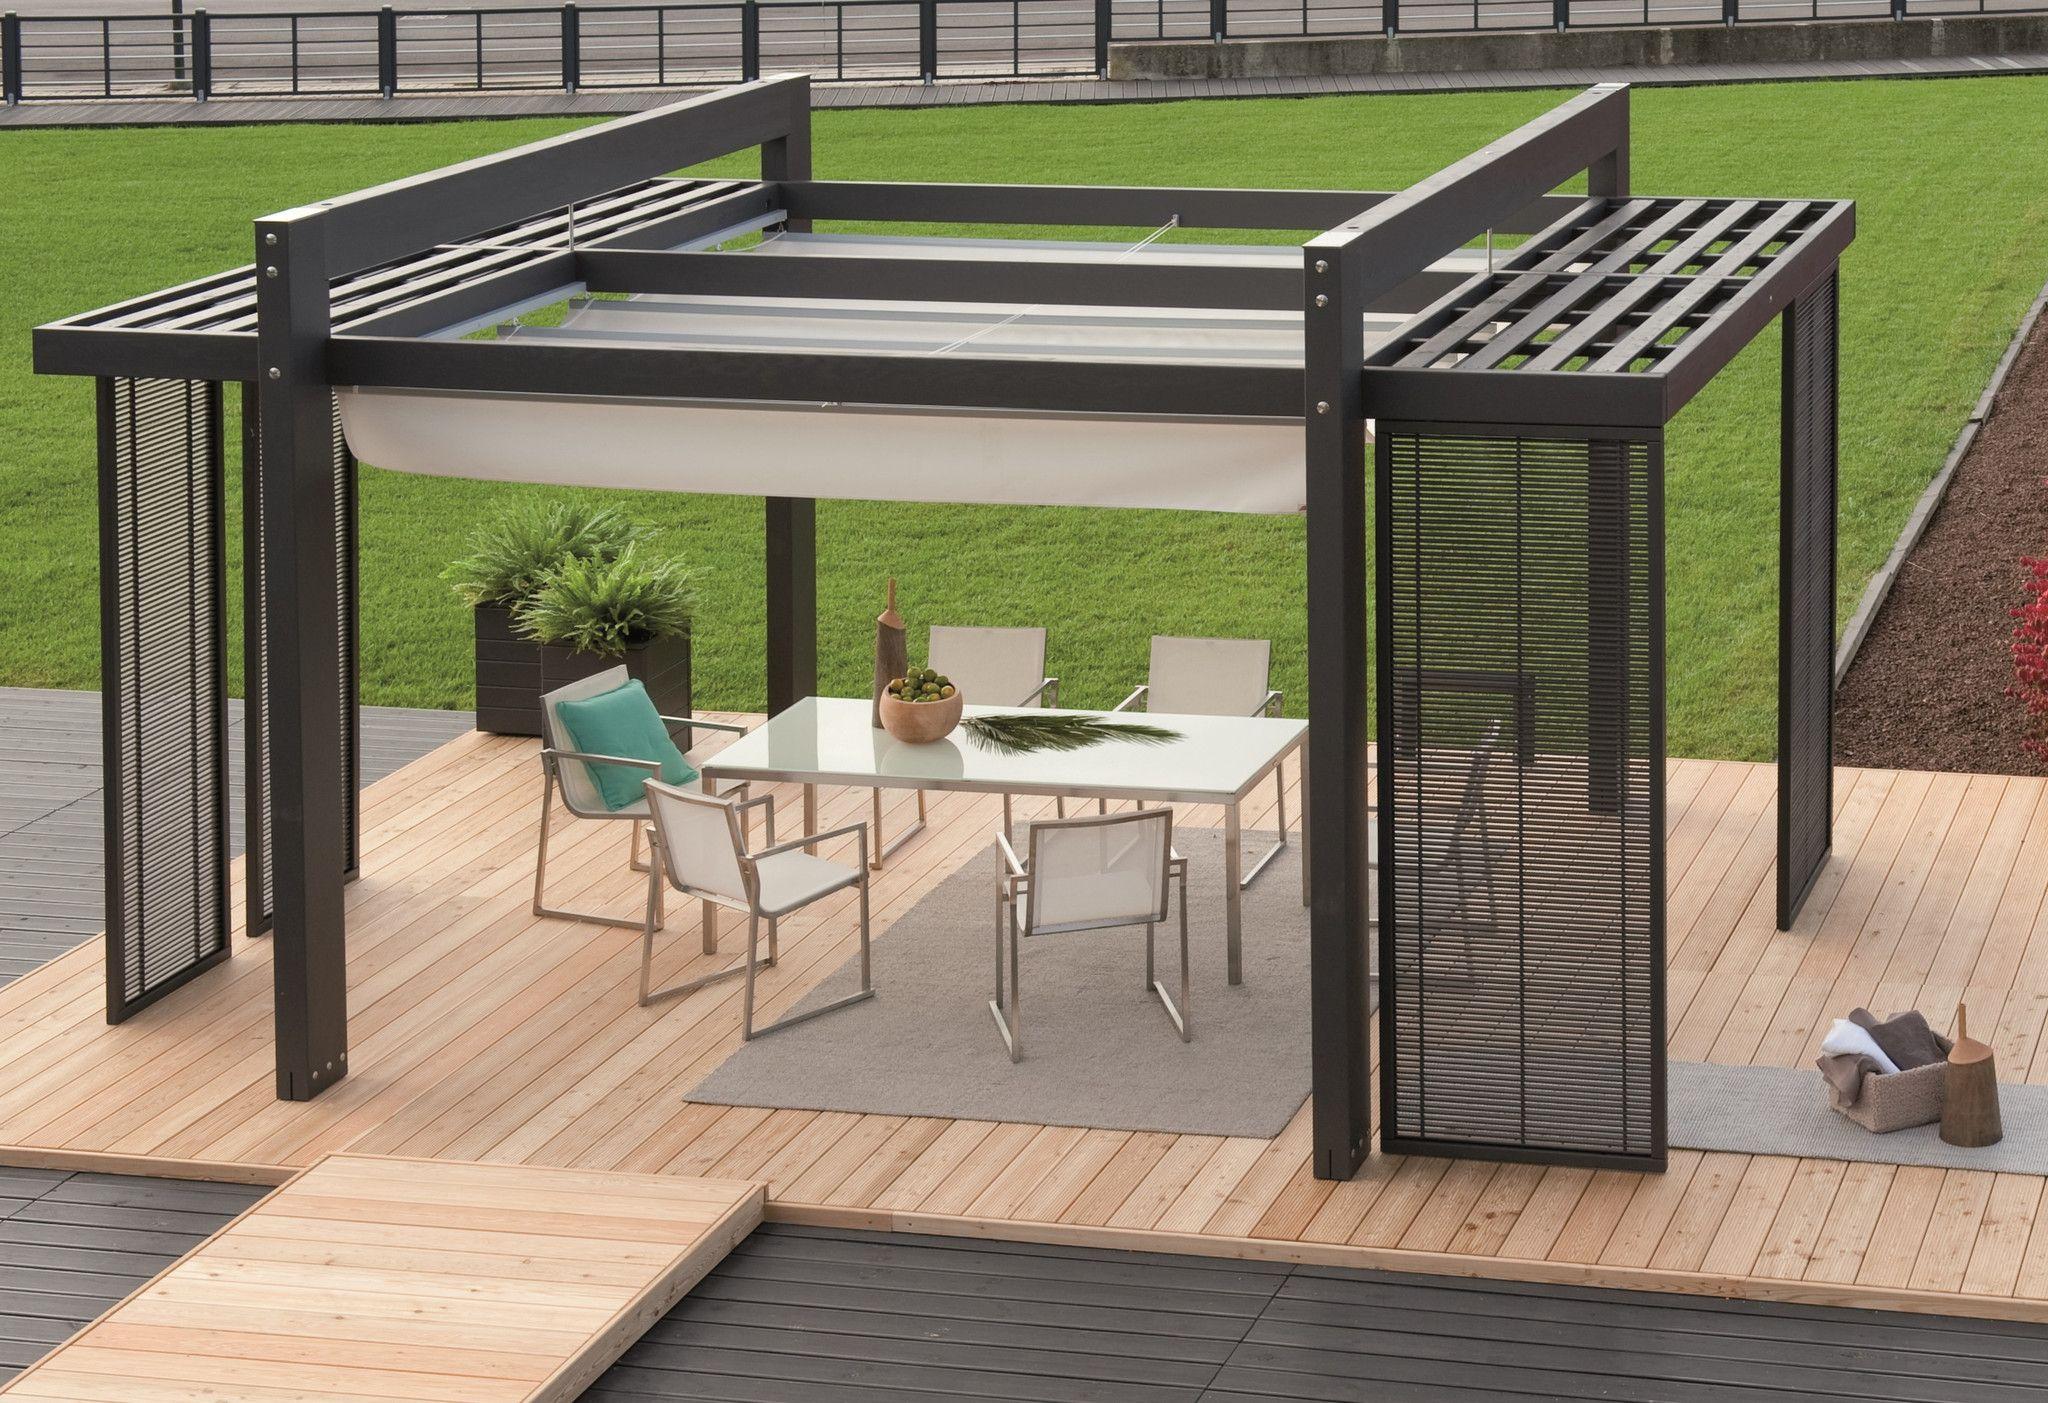 Laria - Modern Italian Wooden Pergola Pools & Outdoor